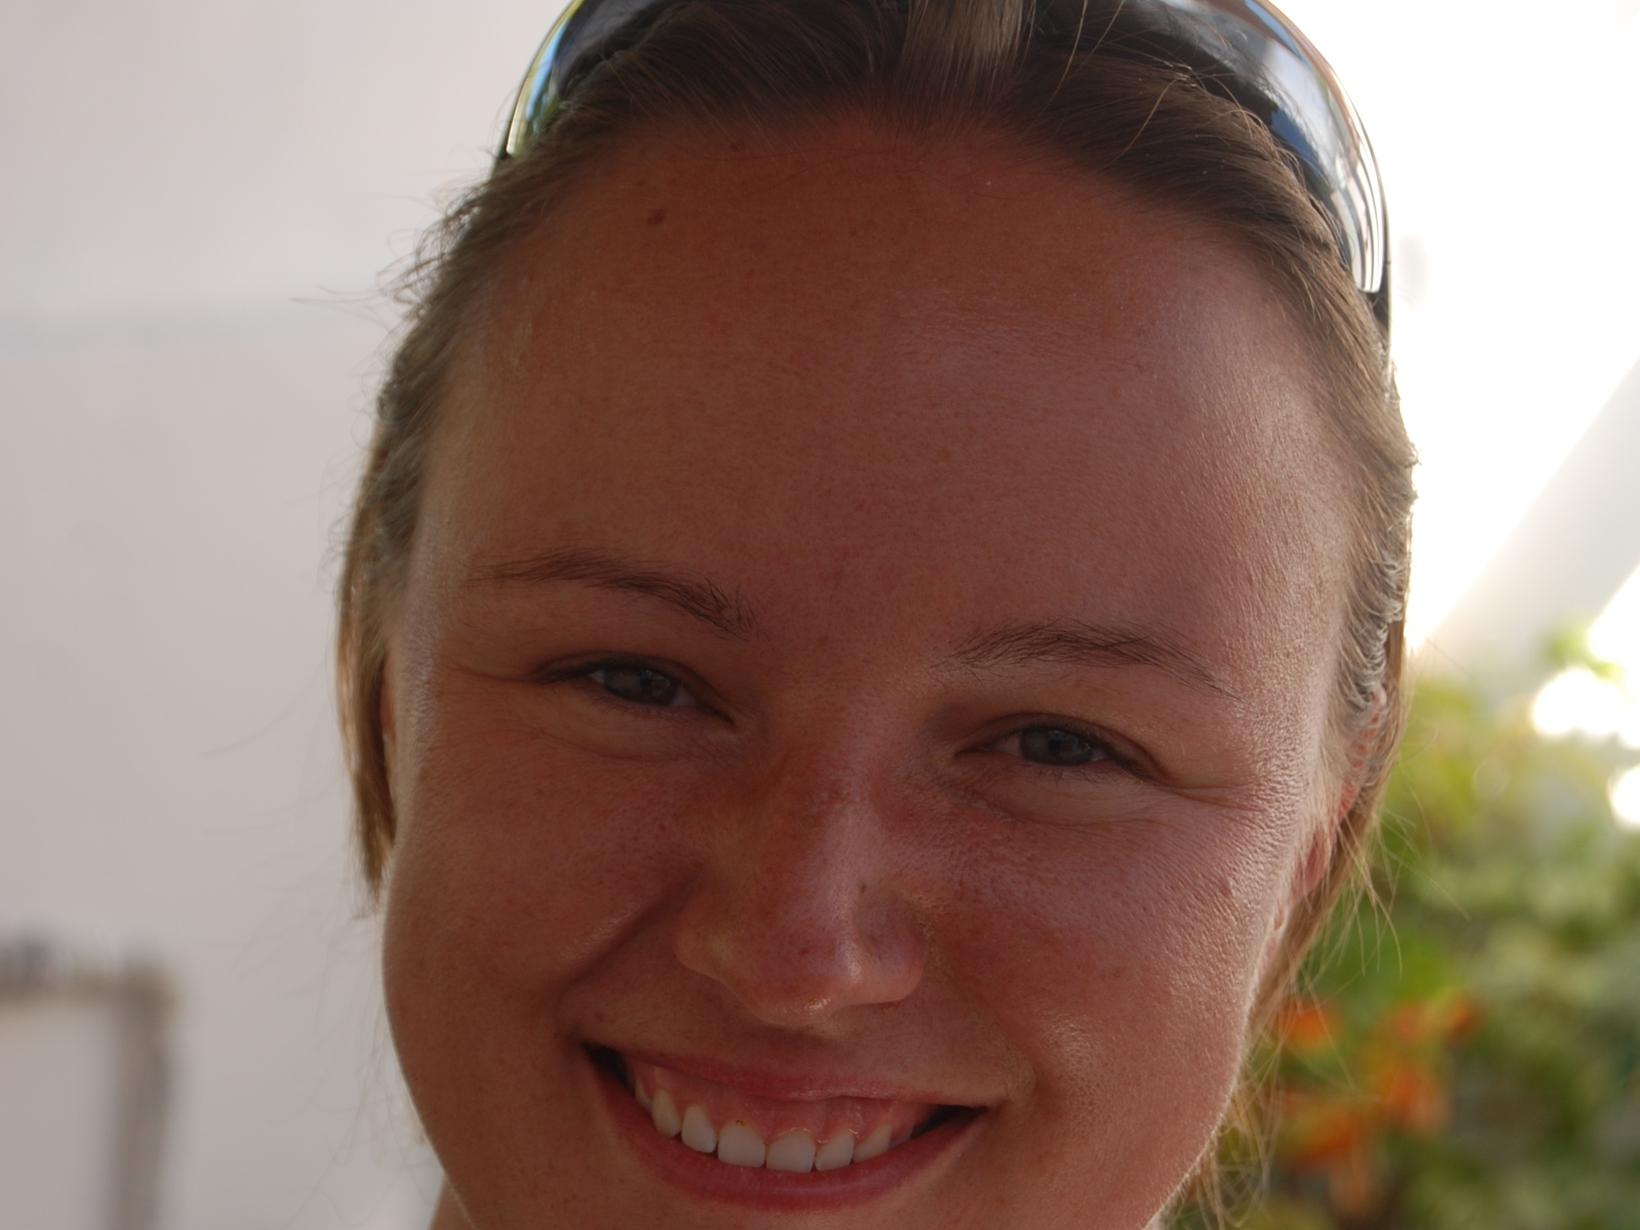 Anna from Jaca, Spain